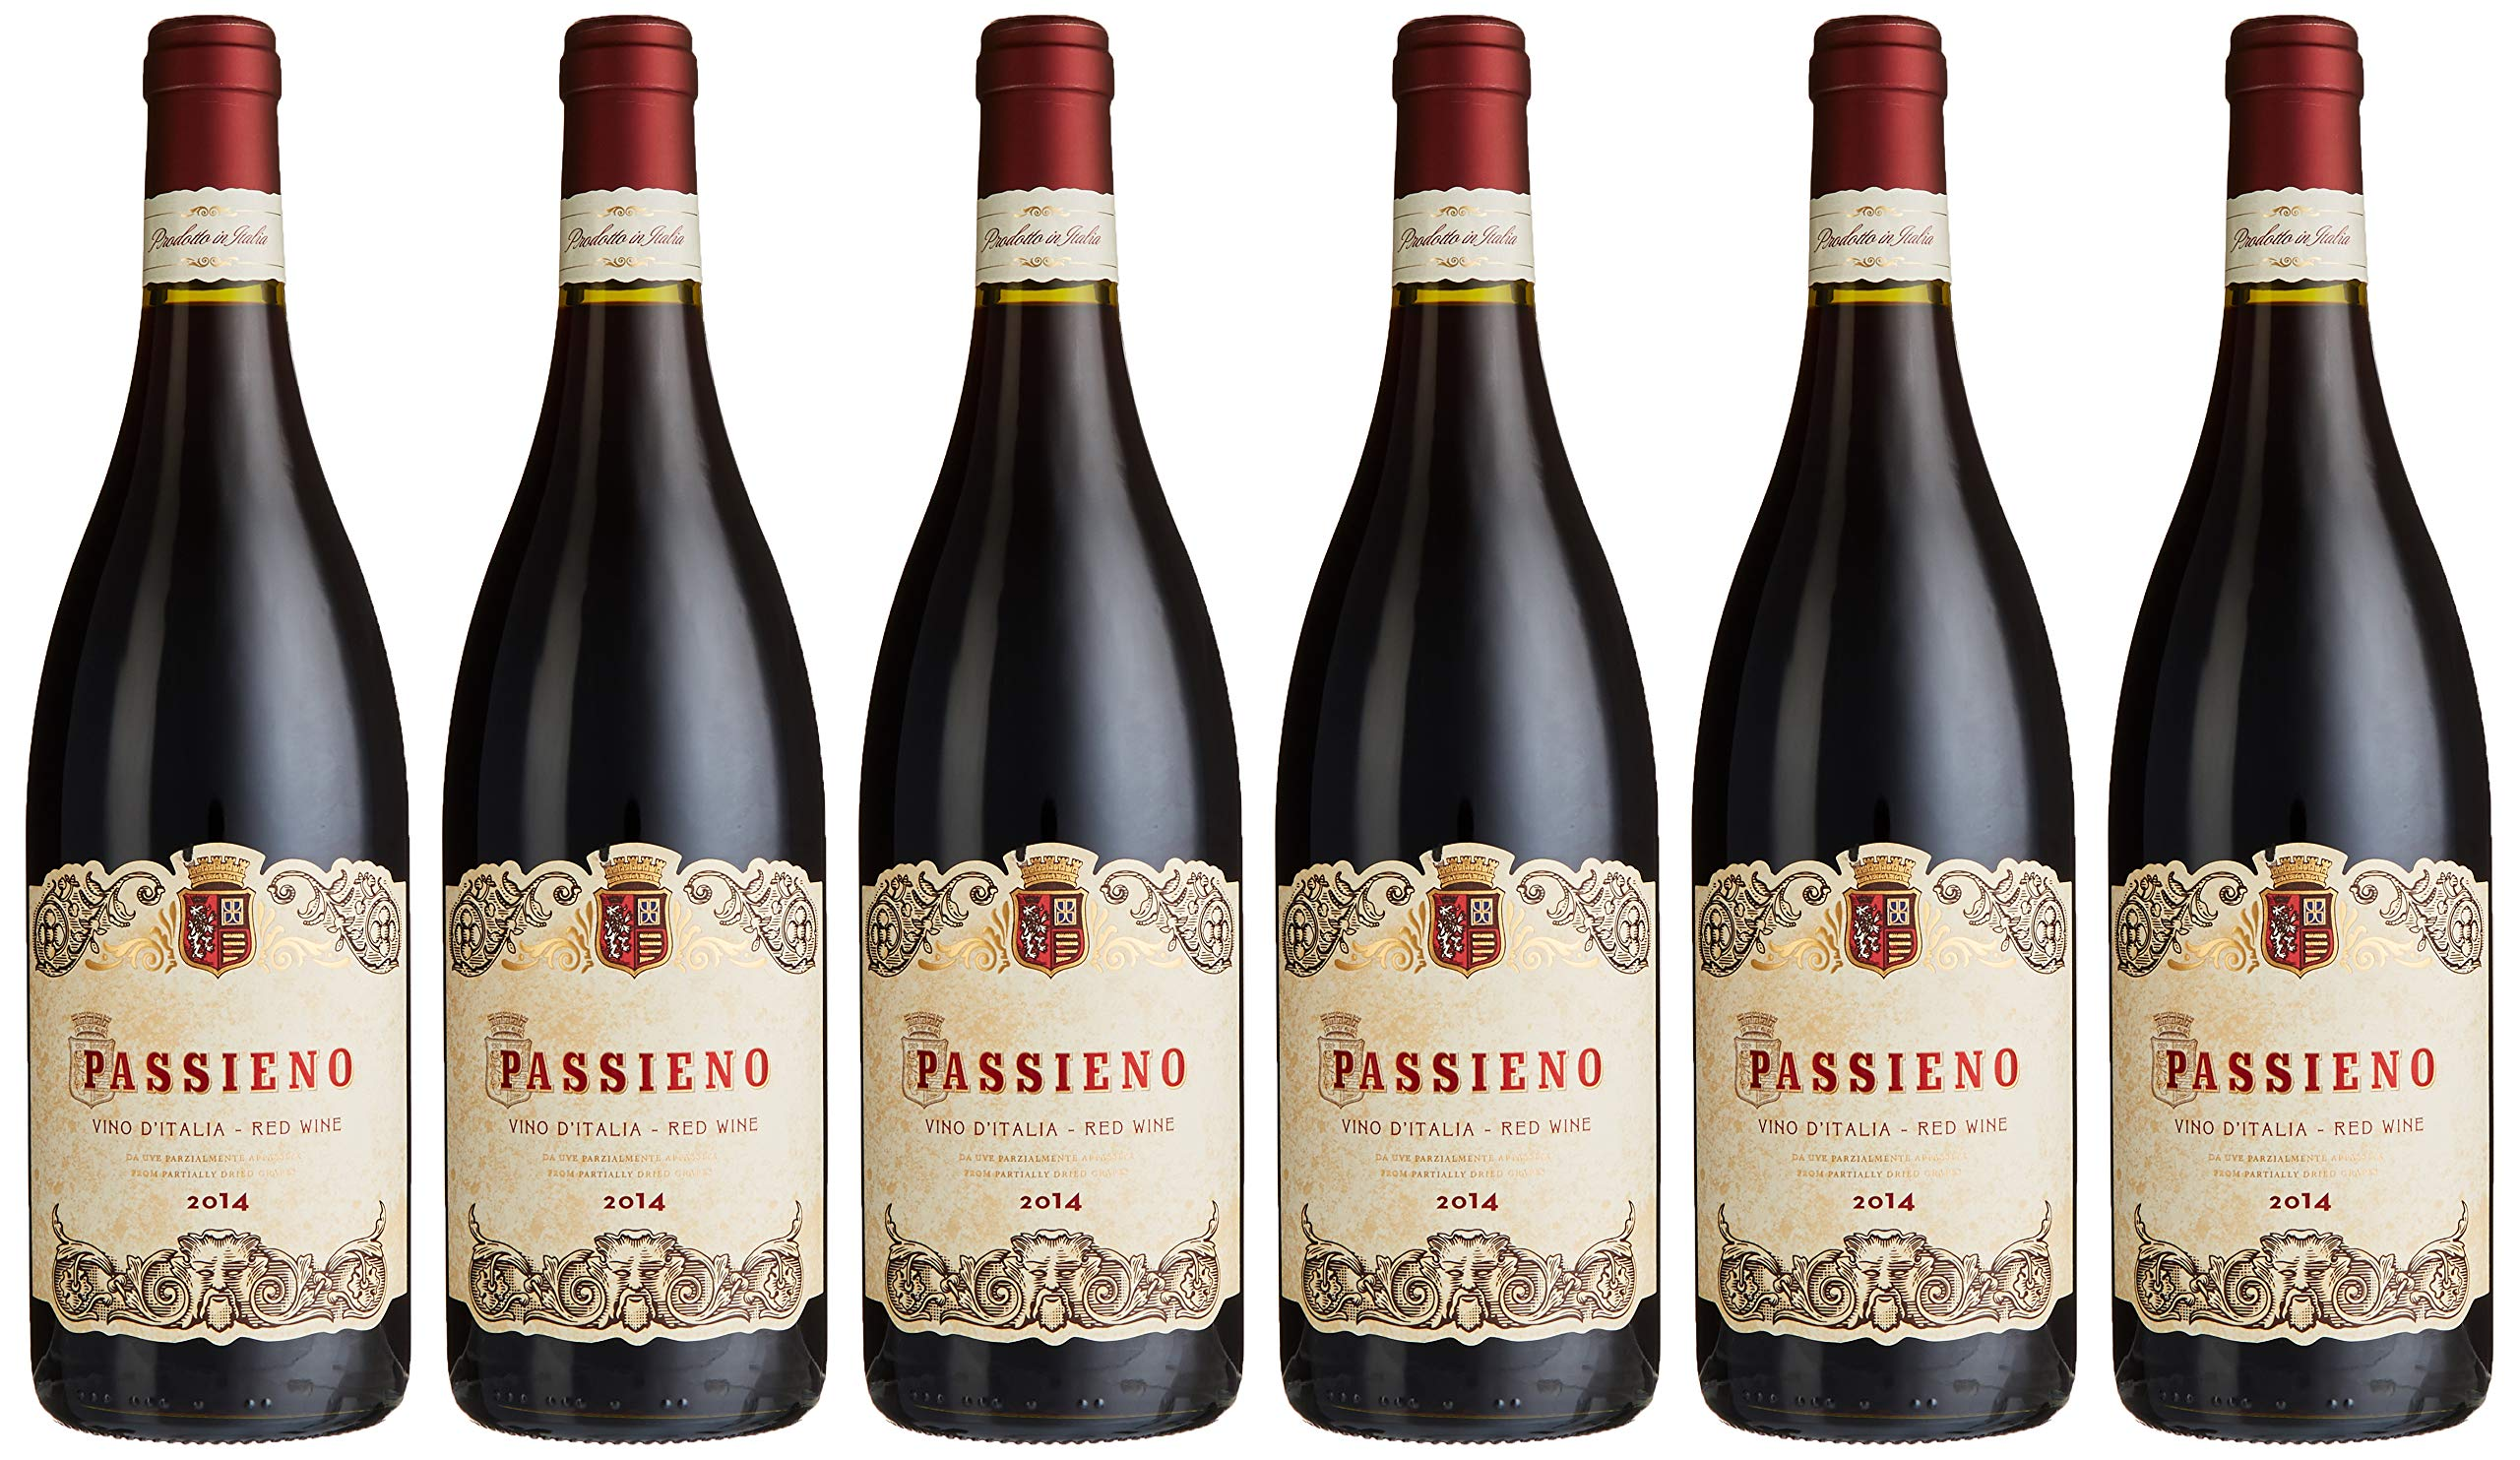 Lamberti-Passieno-Appassimento-Rotwein-2014-trocken-Wein-6-x-075-l